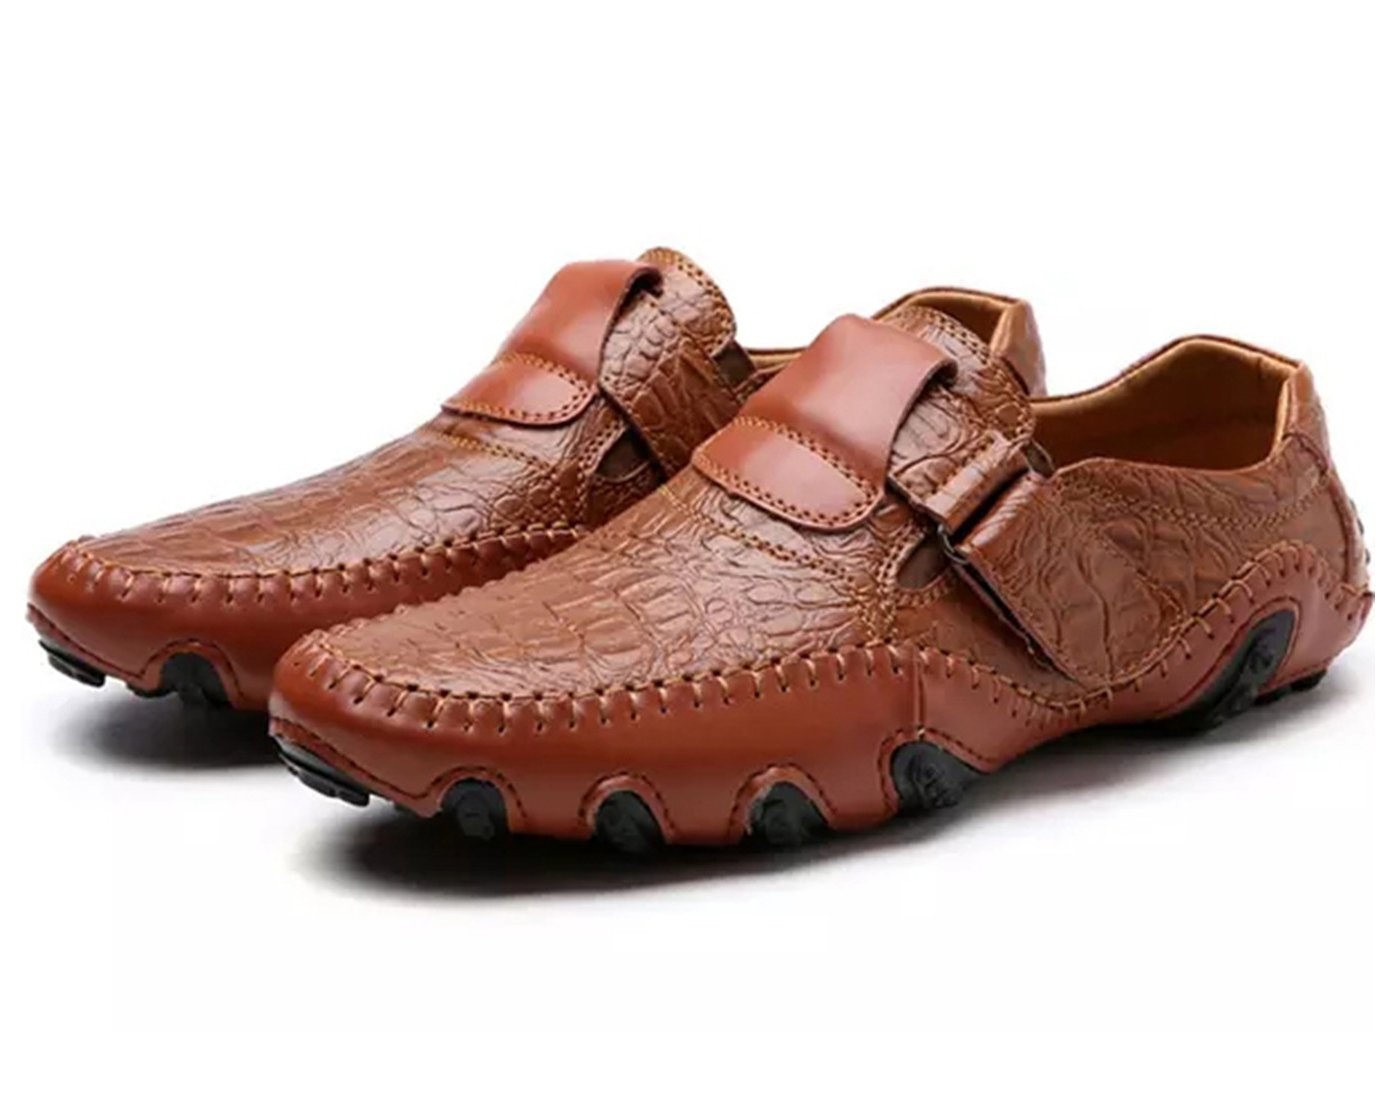 SZAWSL Herren Leder Schuhe Slipper Elegant Flache Loafers Bootsschuhe Derby  E U 40|Braun